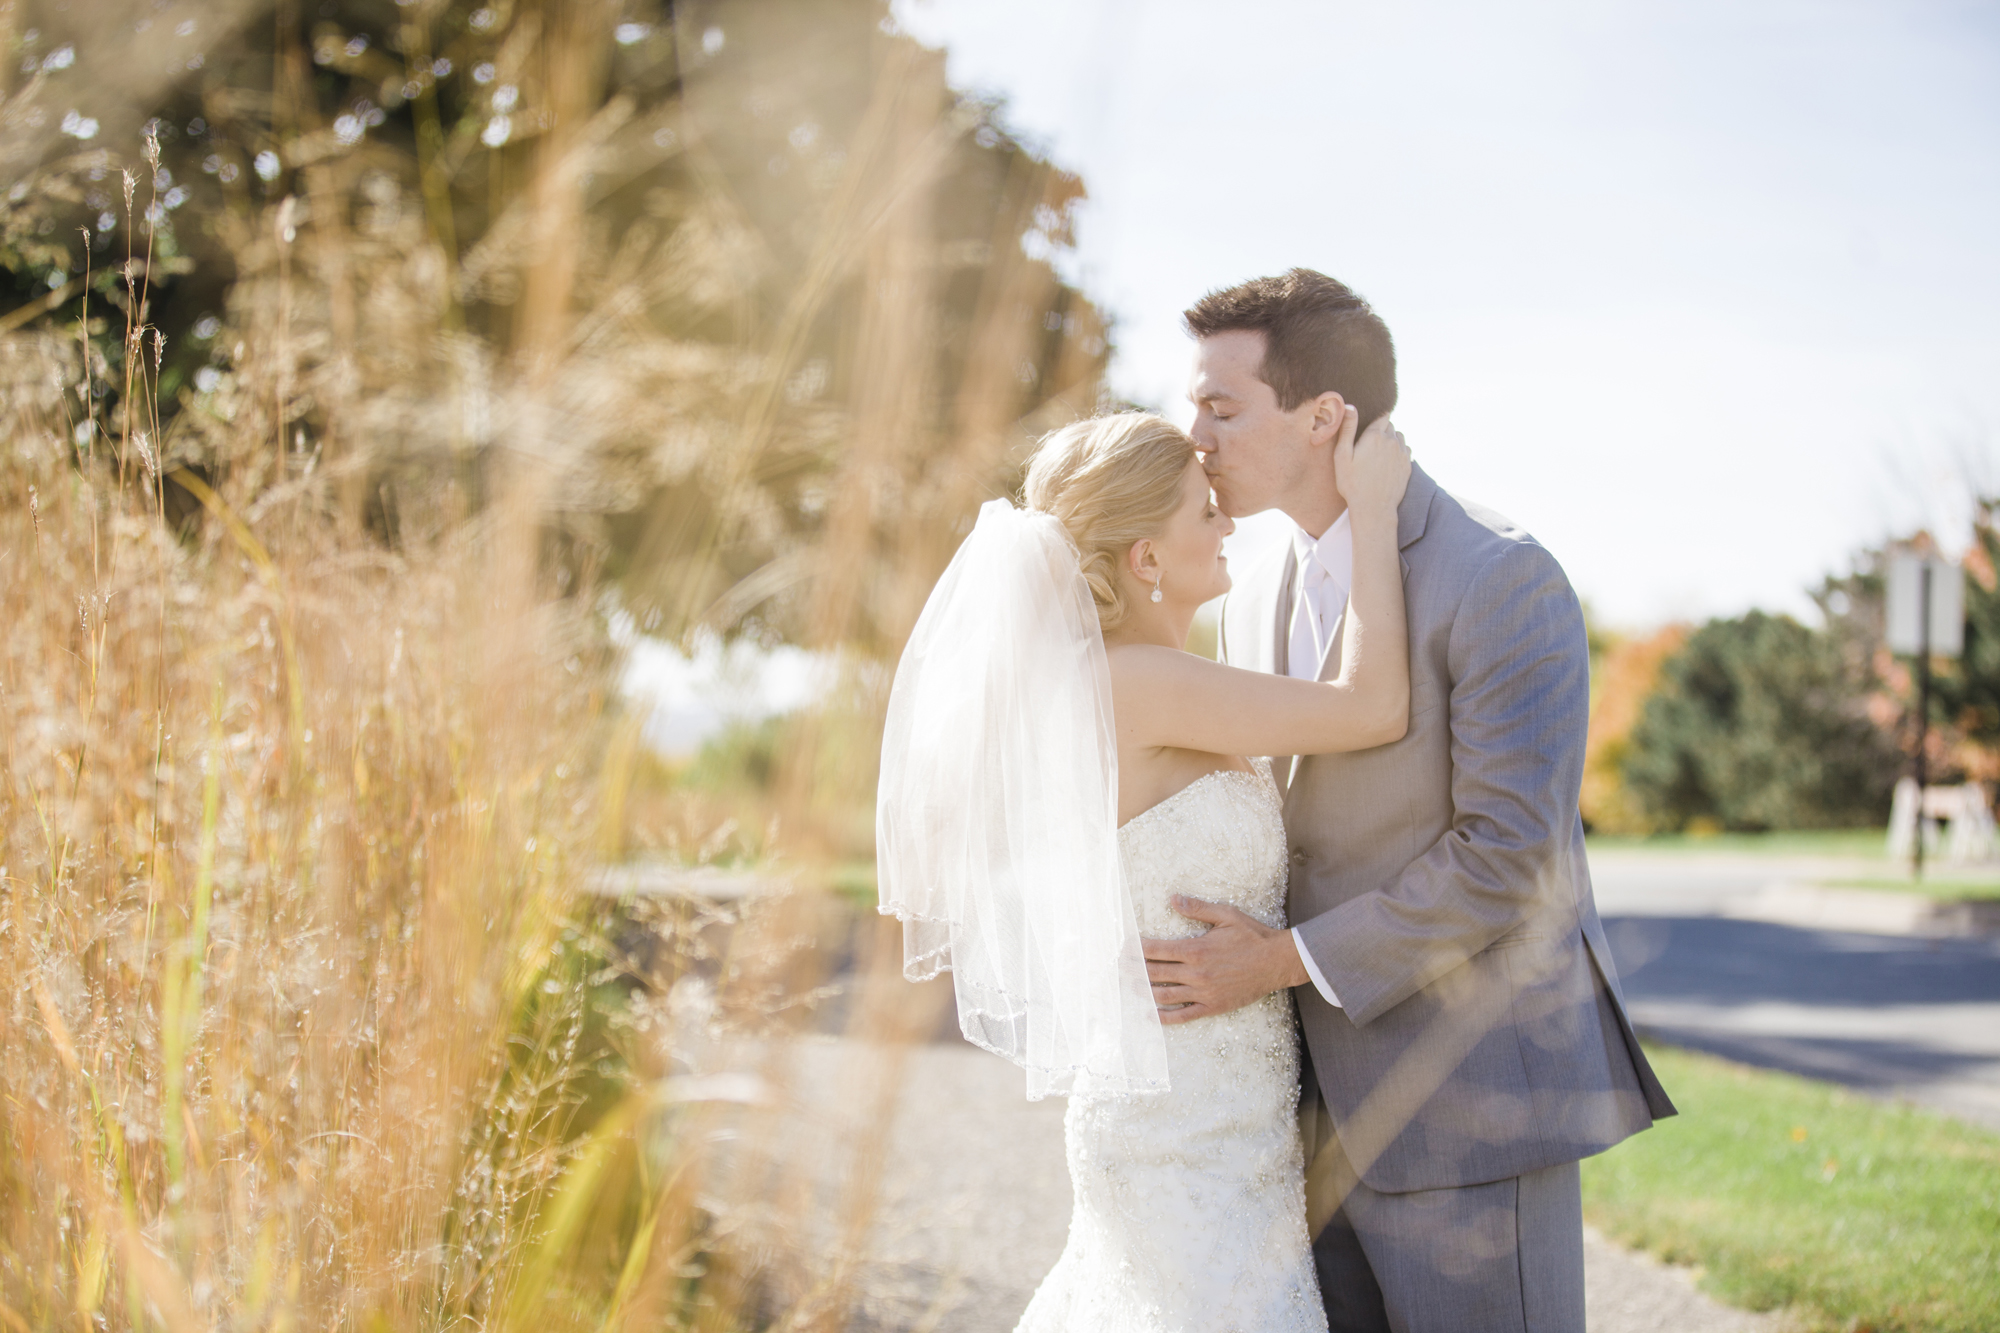 014_LH_MN_Wedding.jpg